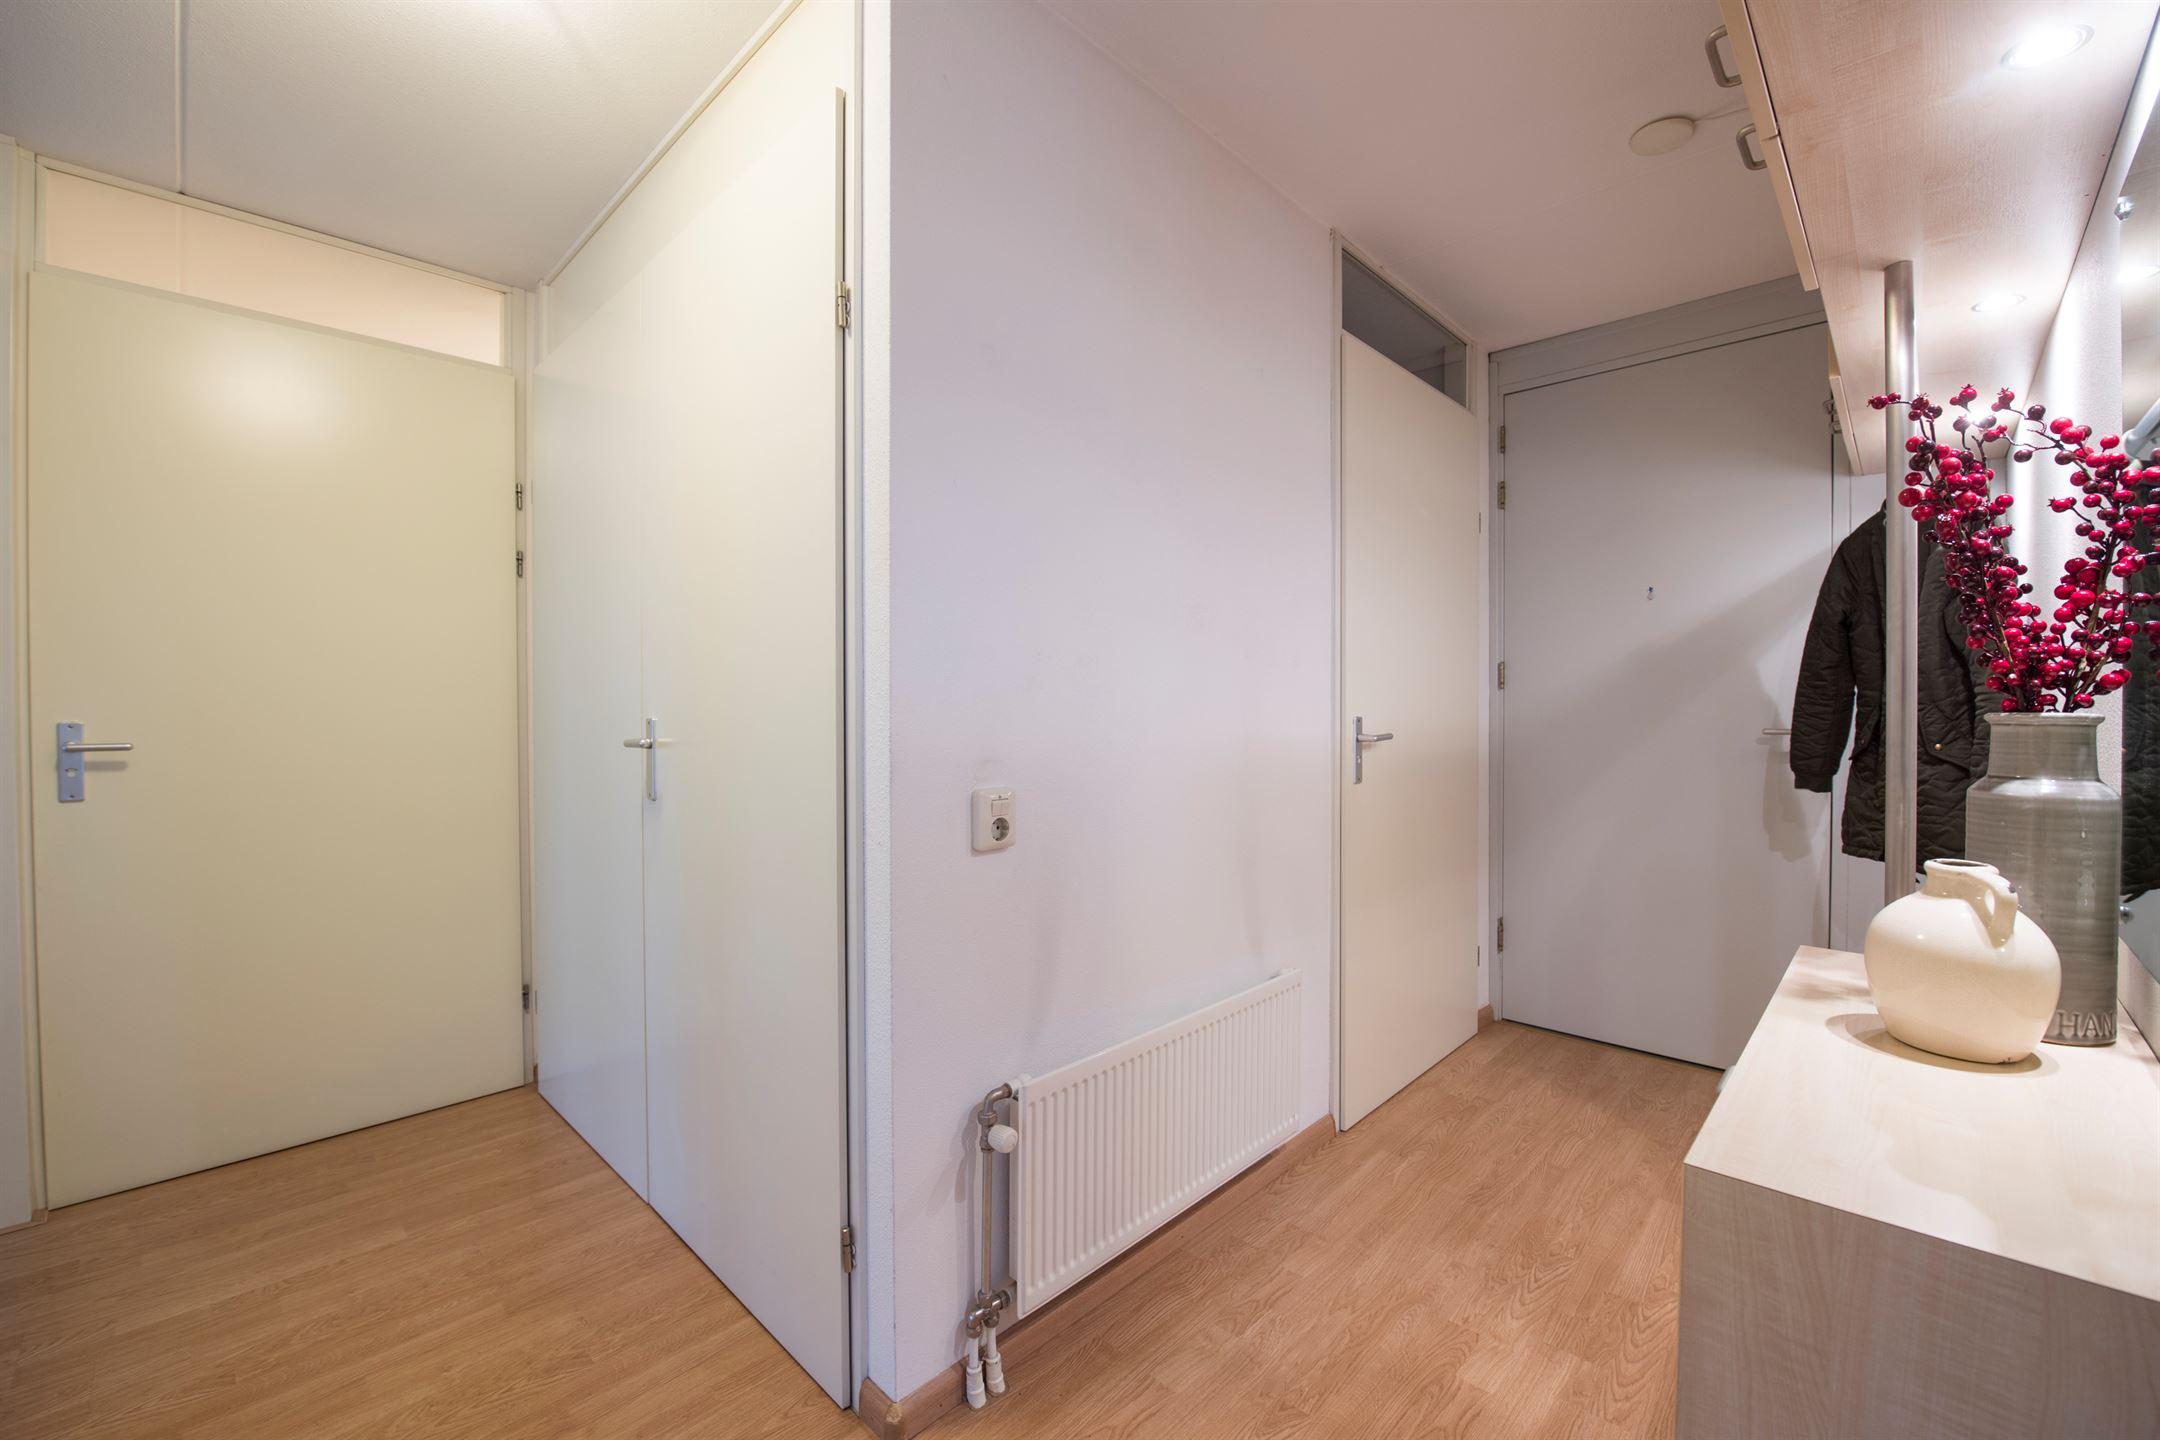 Appartement te koop gotenpark 155 5037 sn tilburg funda - Modern volwassen kamer behang ...